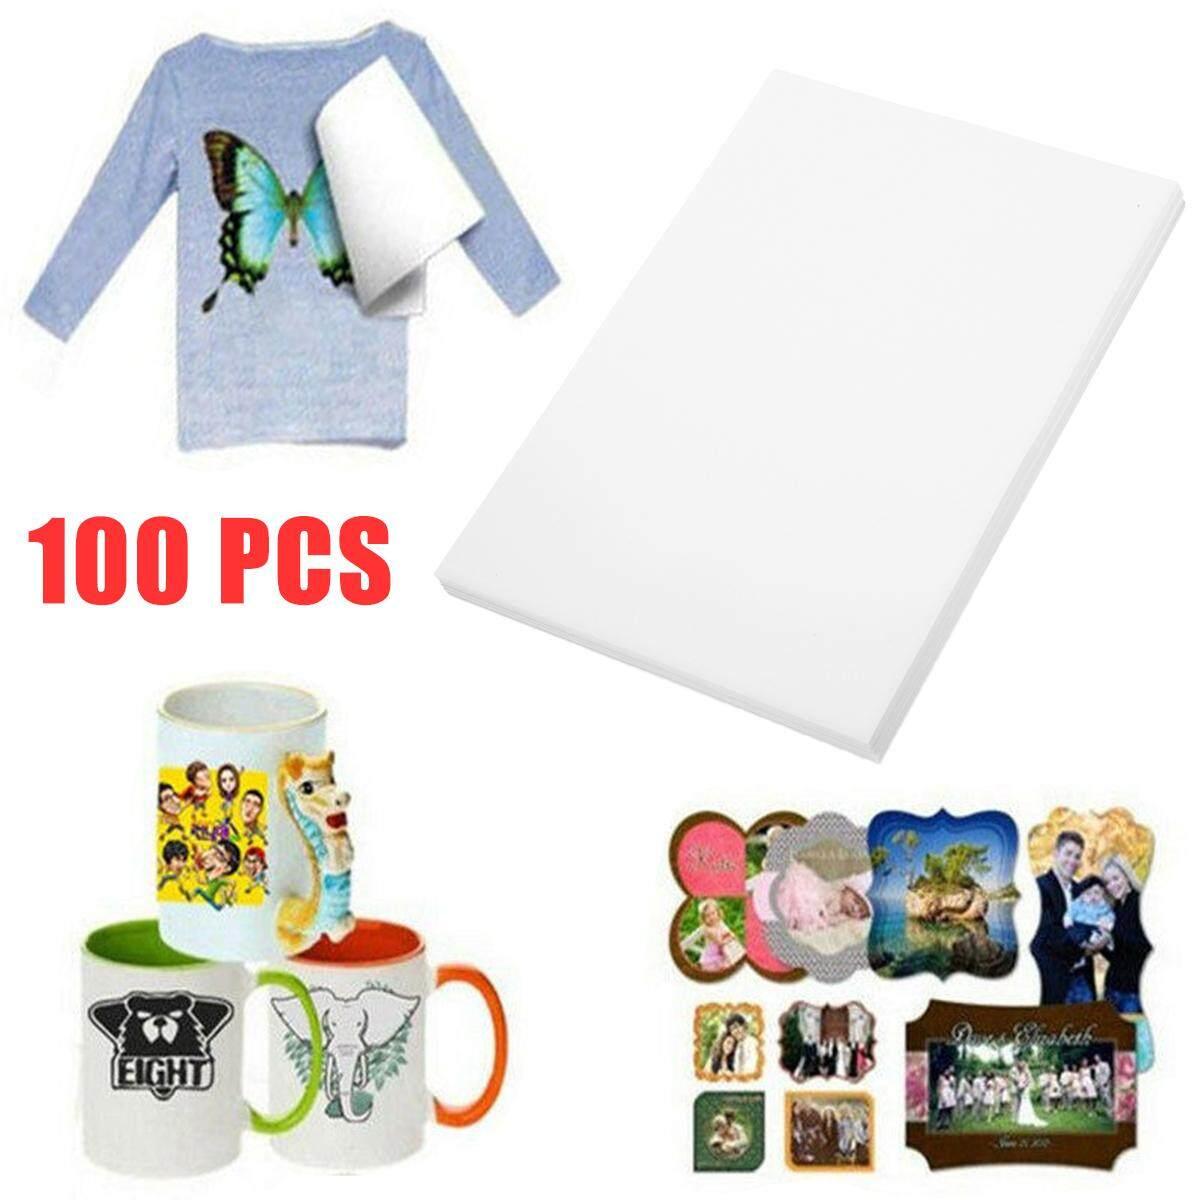 100Pcs White A4 Heat Transfer Iron T On For shirt Fabric Inkjet Paper Light